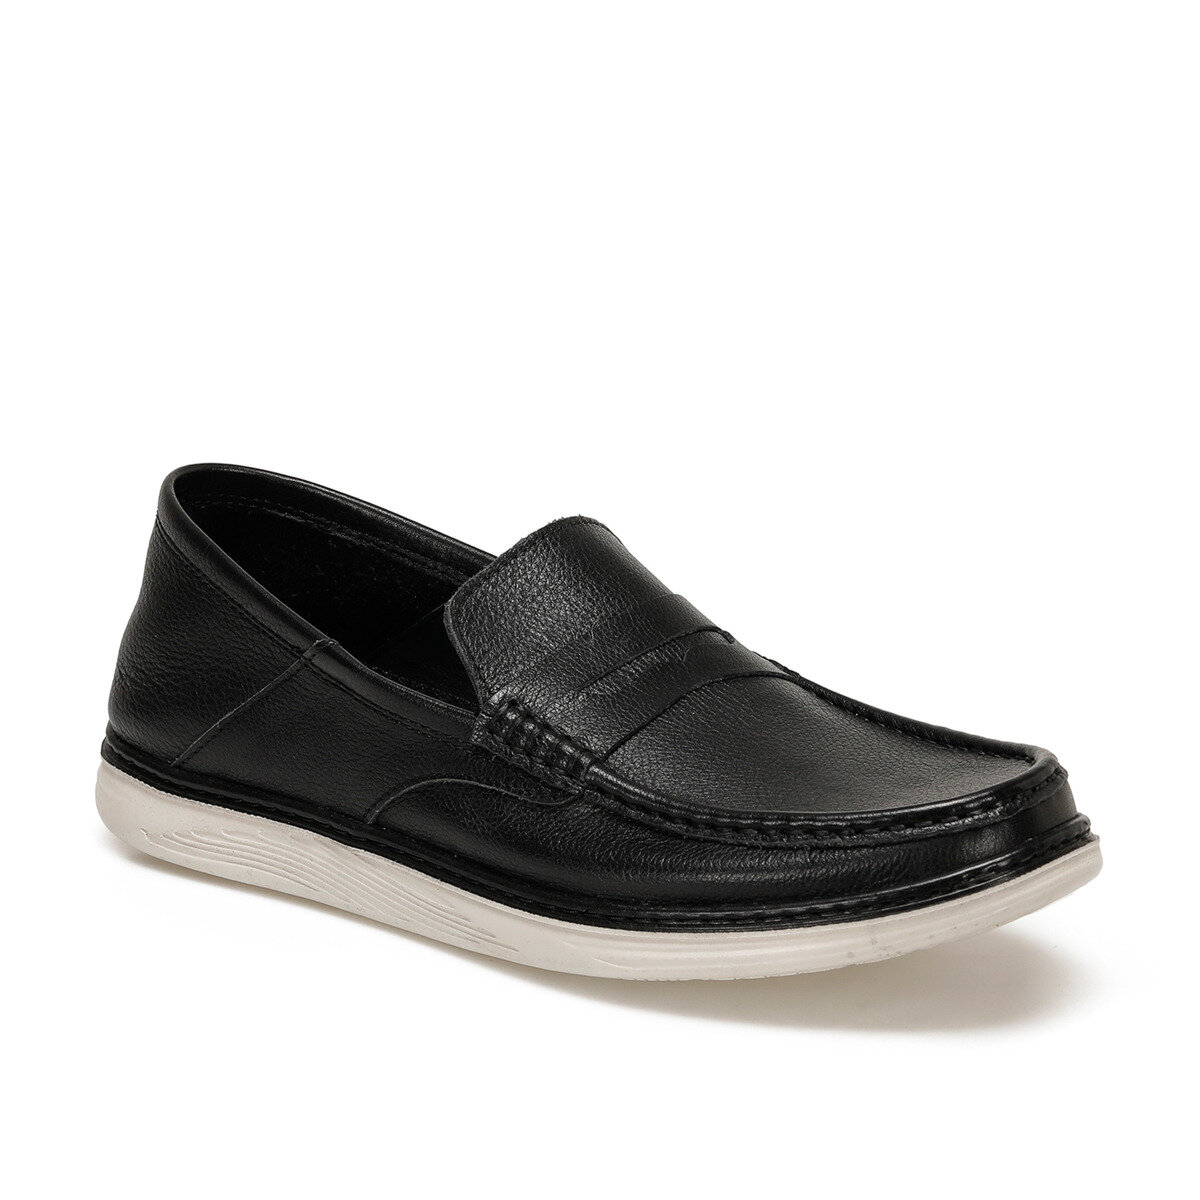 FLO GZL-66 Black Men 'S Comfort Shoes Flogart